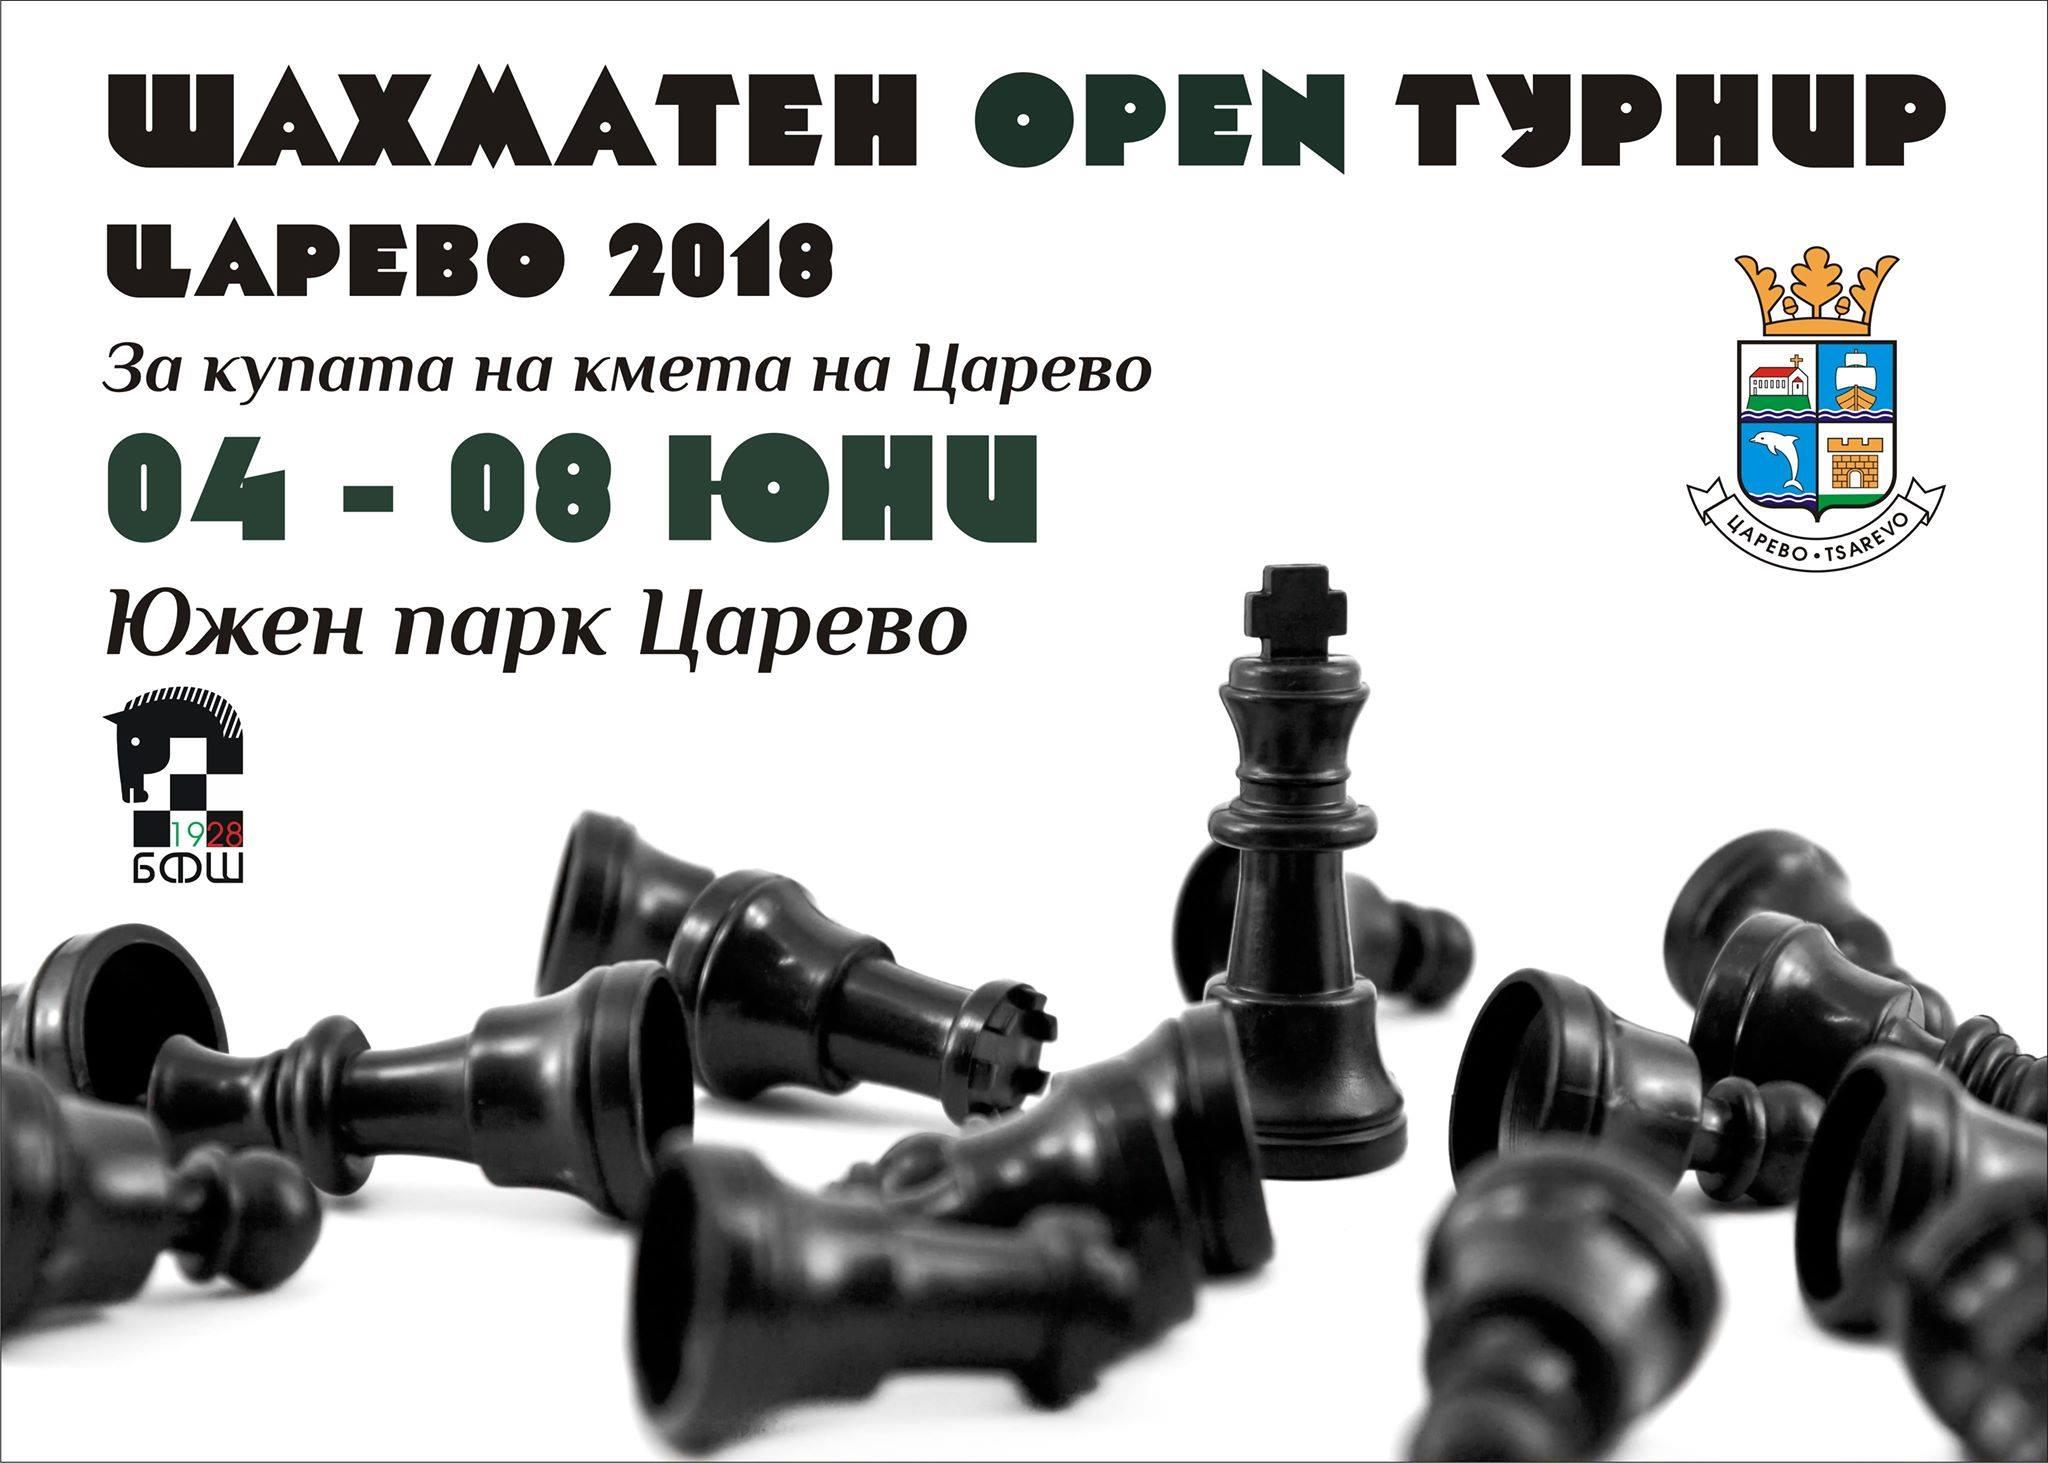 Международен отворен шахматен турнир